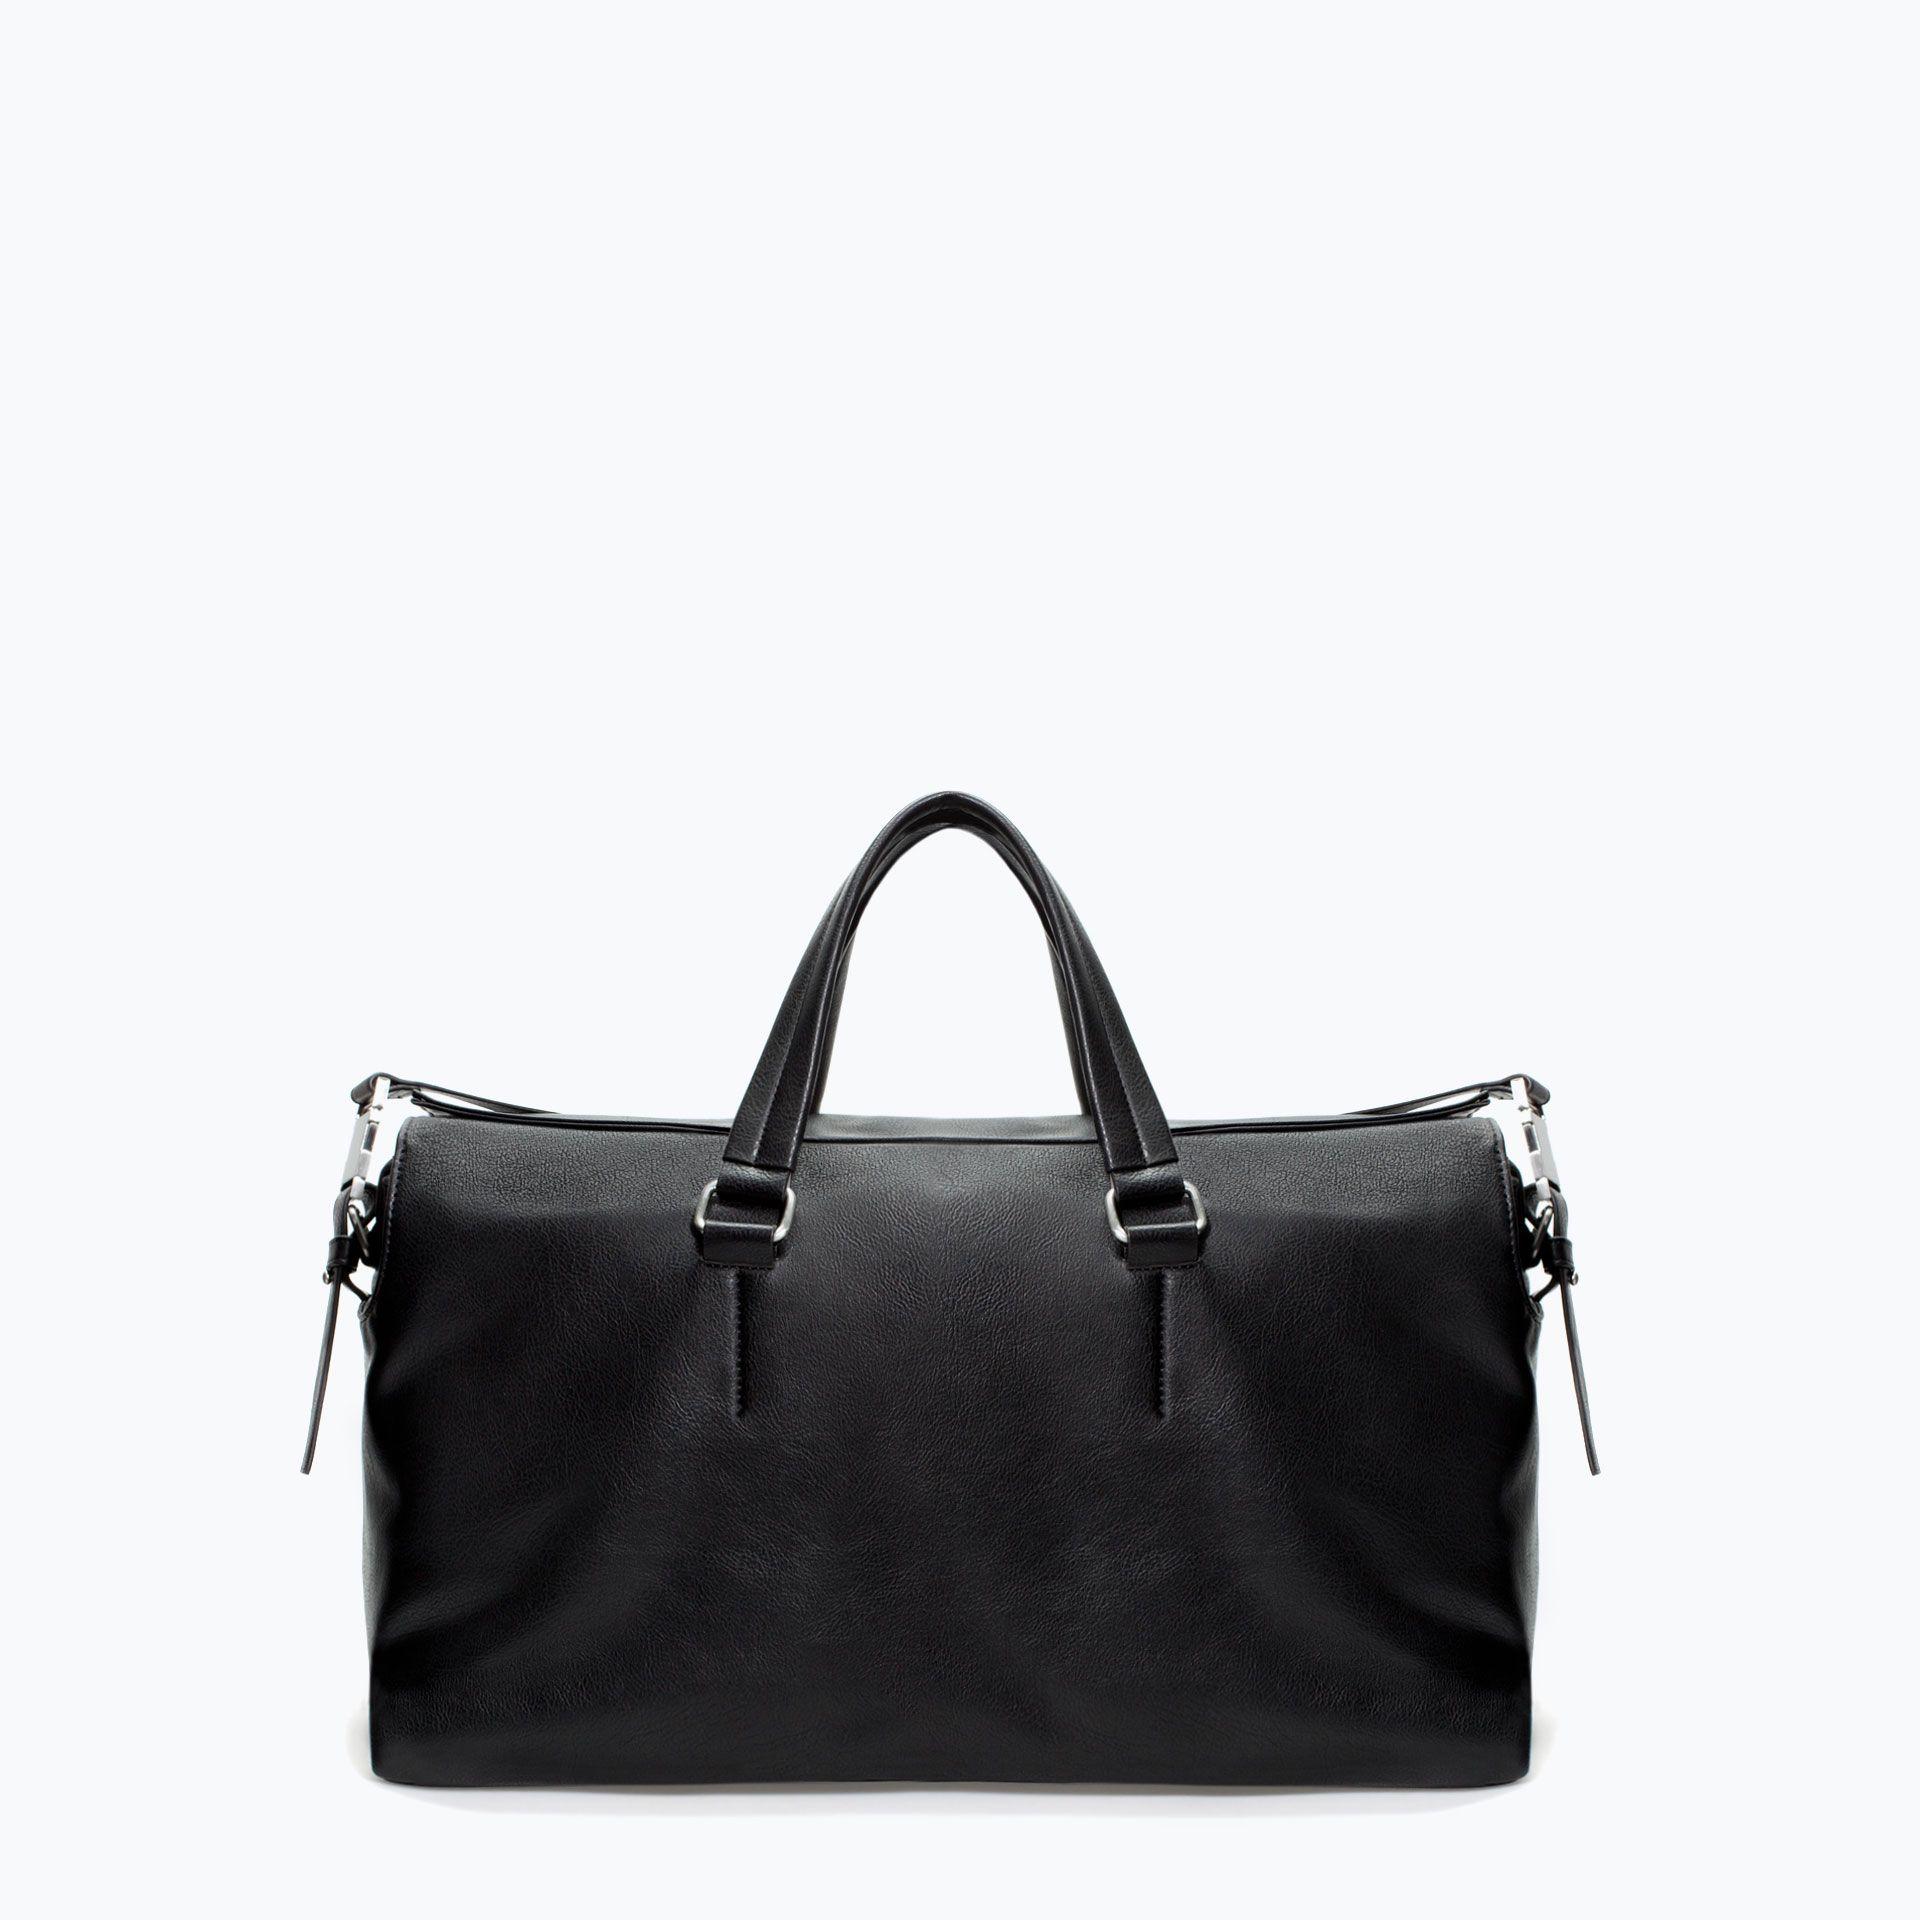 Image 1 of TRAVEL BAG from Zara Mens travel bag